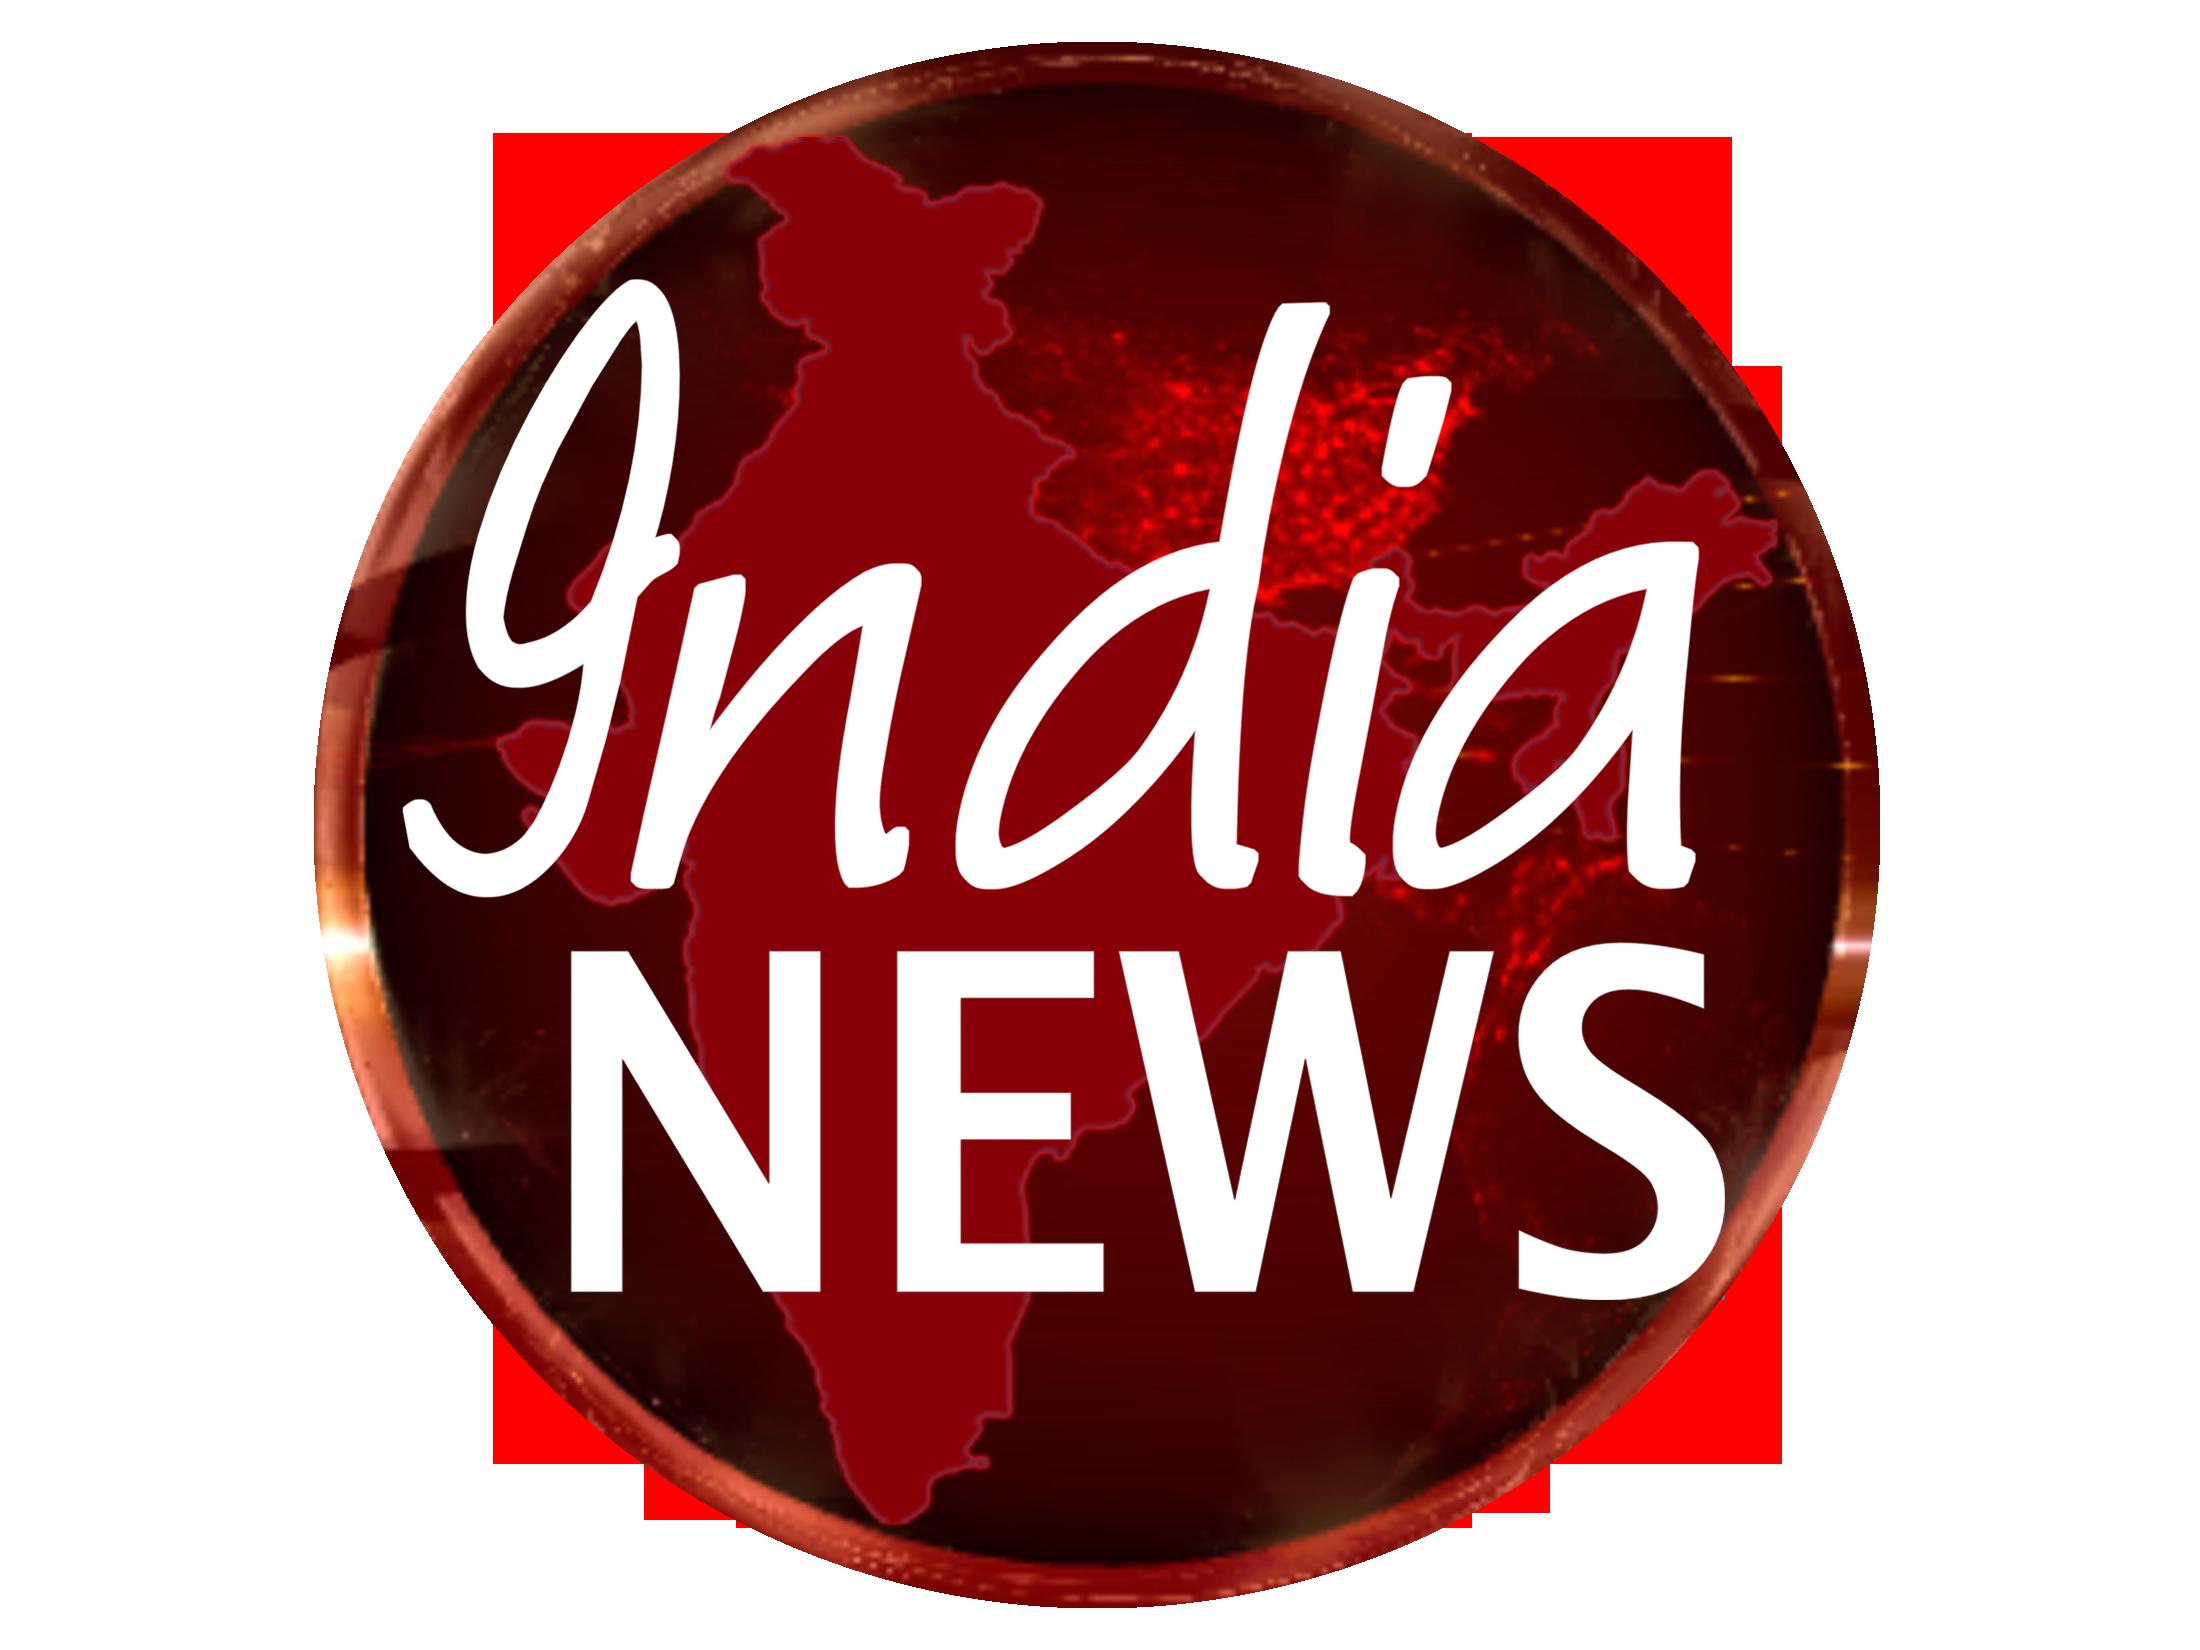 NEWS IN BRIEF – DEC 16, 2011